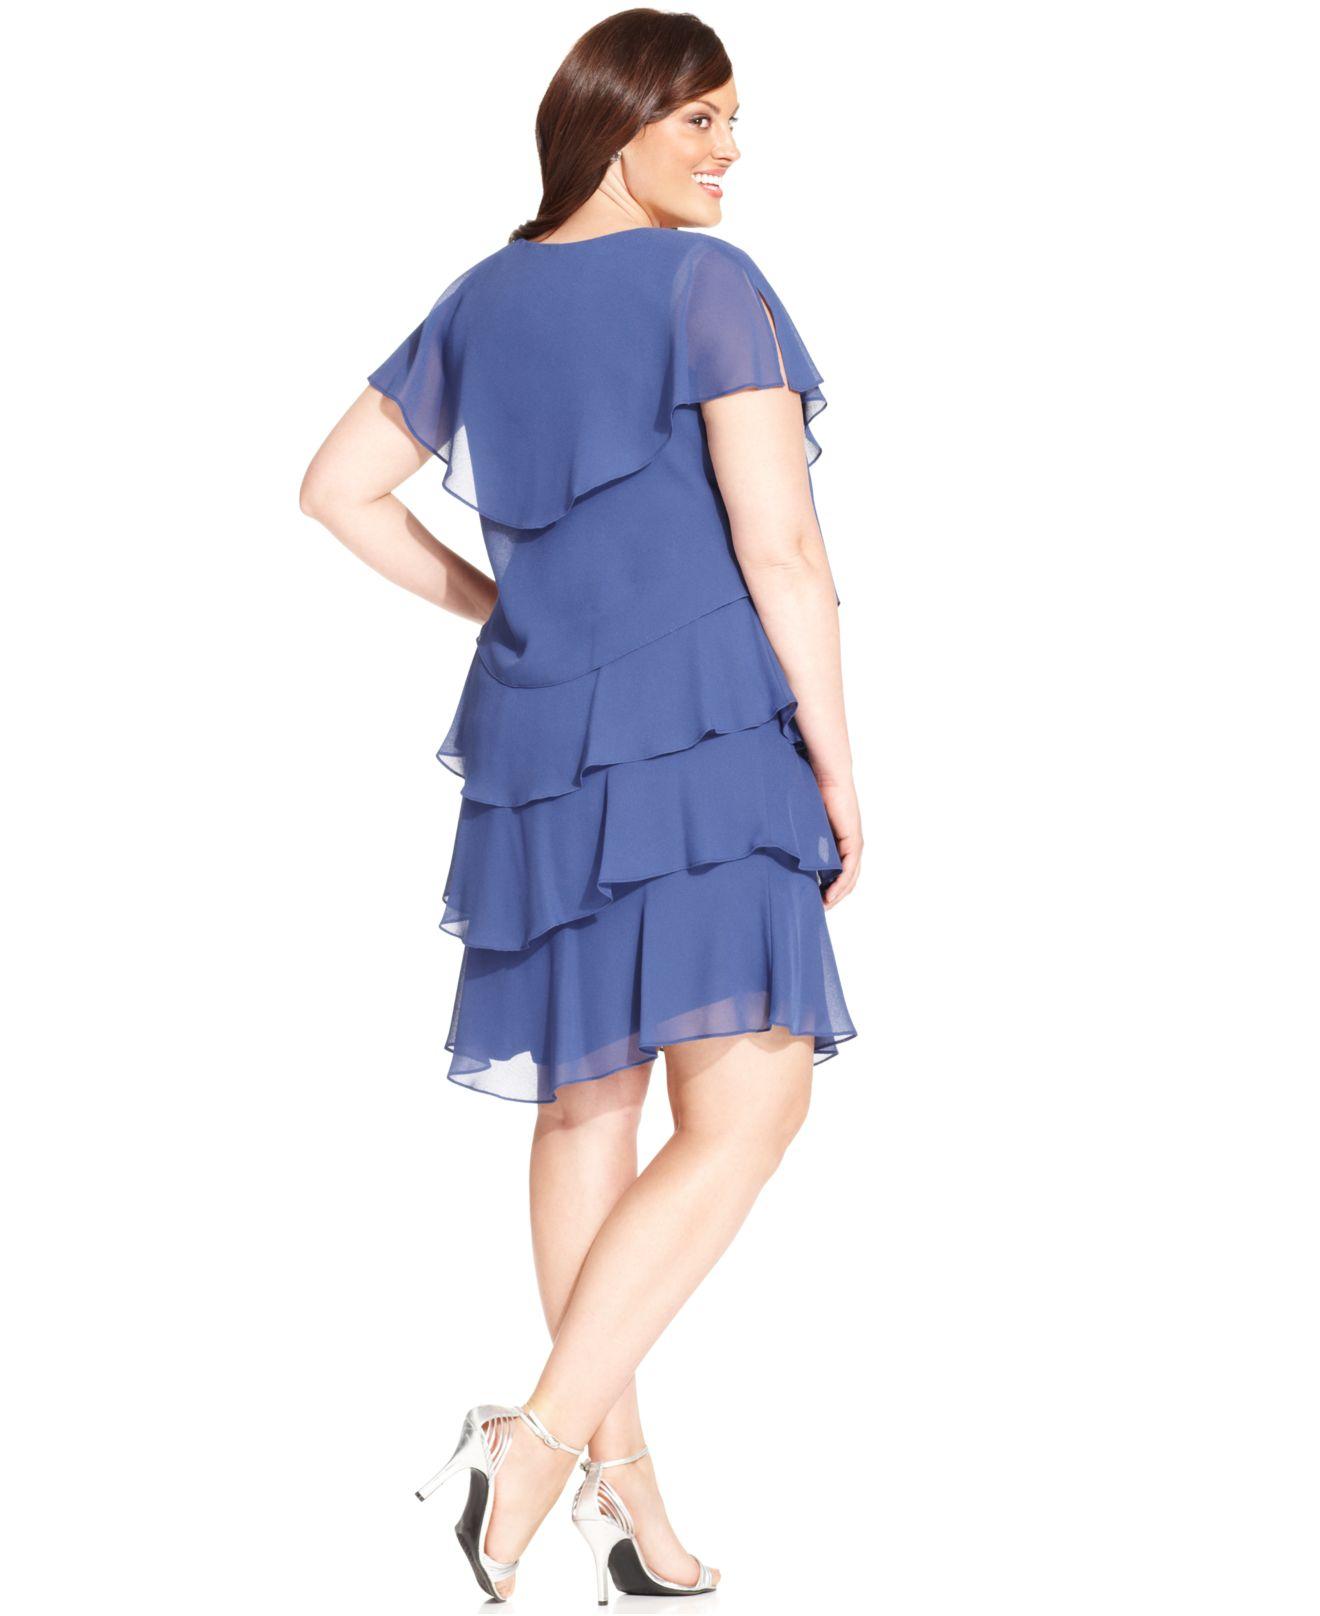 Patra Blue Plus Size Shortsleeve Tiered Dress